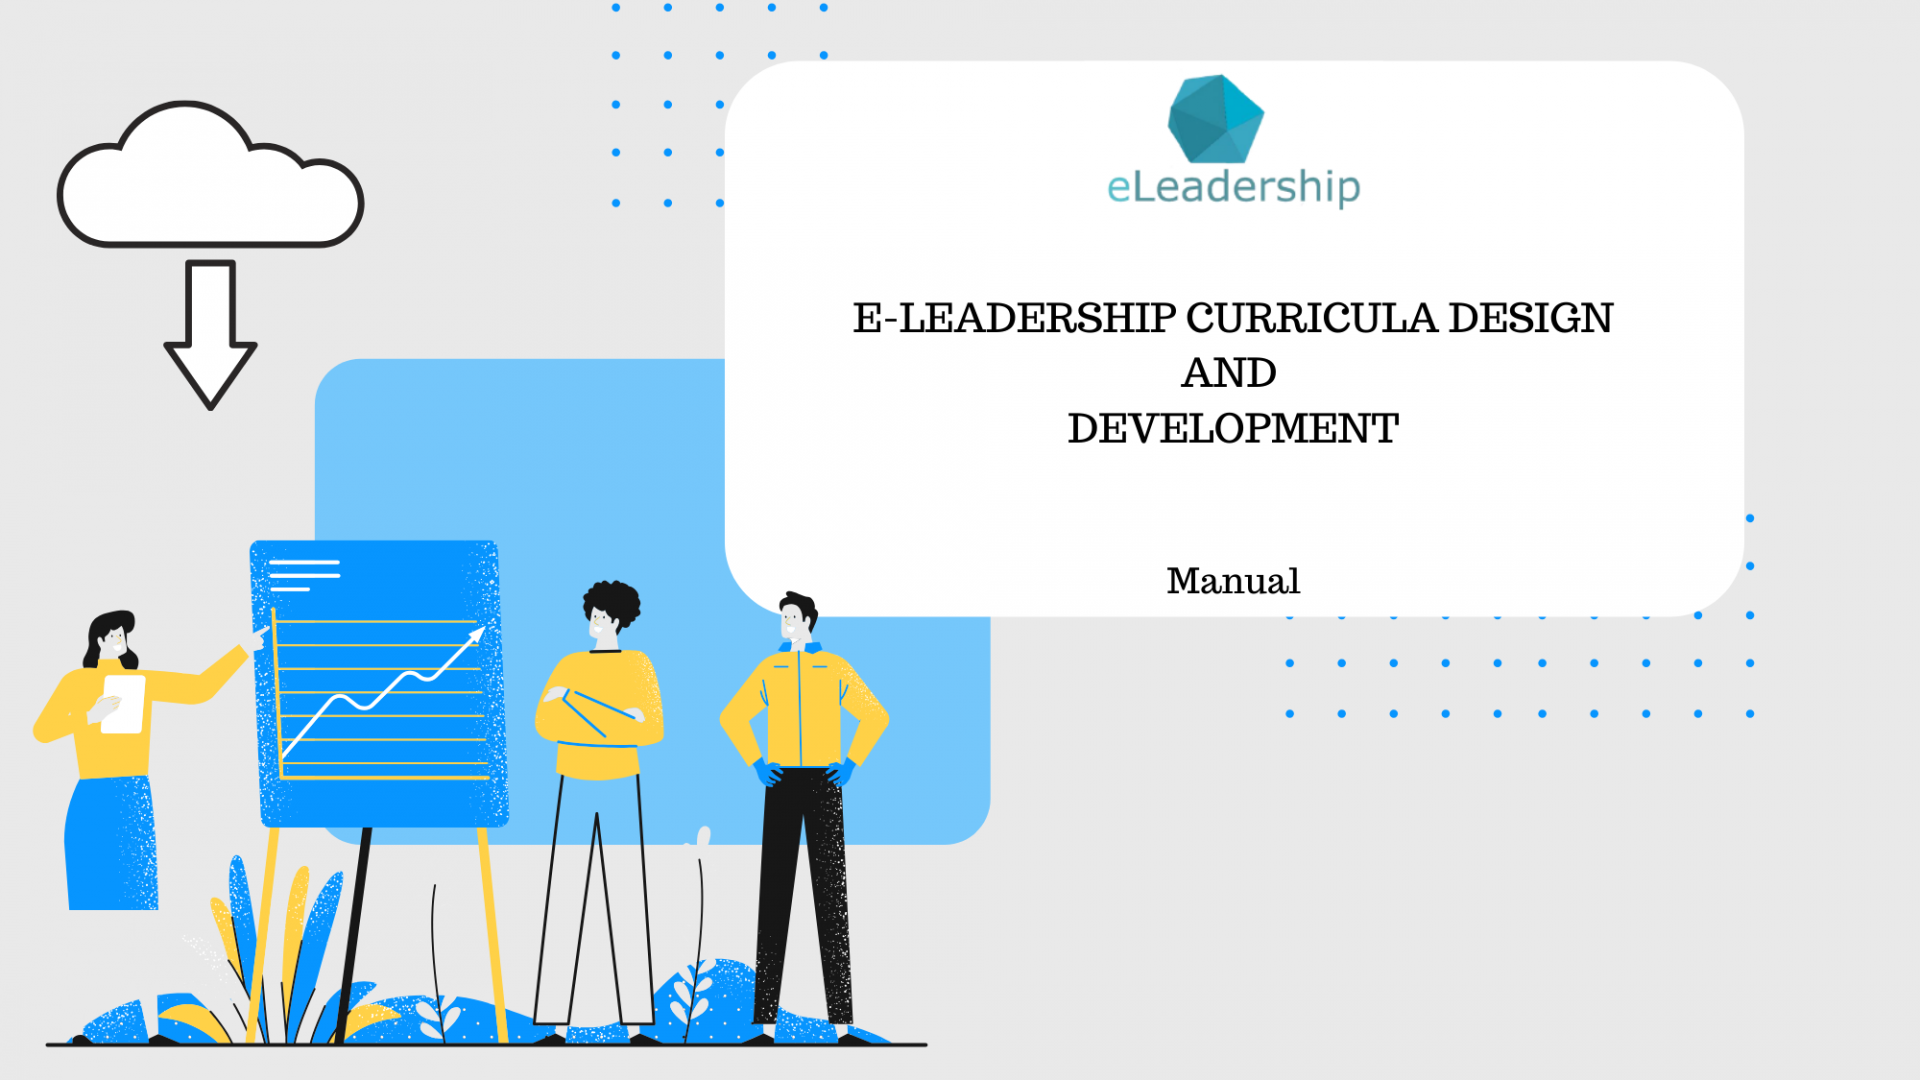 E-LEADERSHIP CURRICULA DESIGN AND DEVELOPMENT